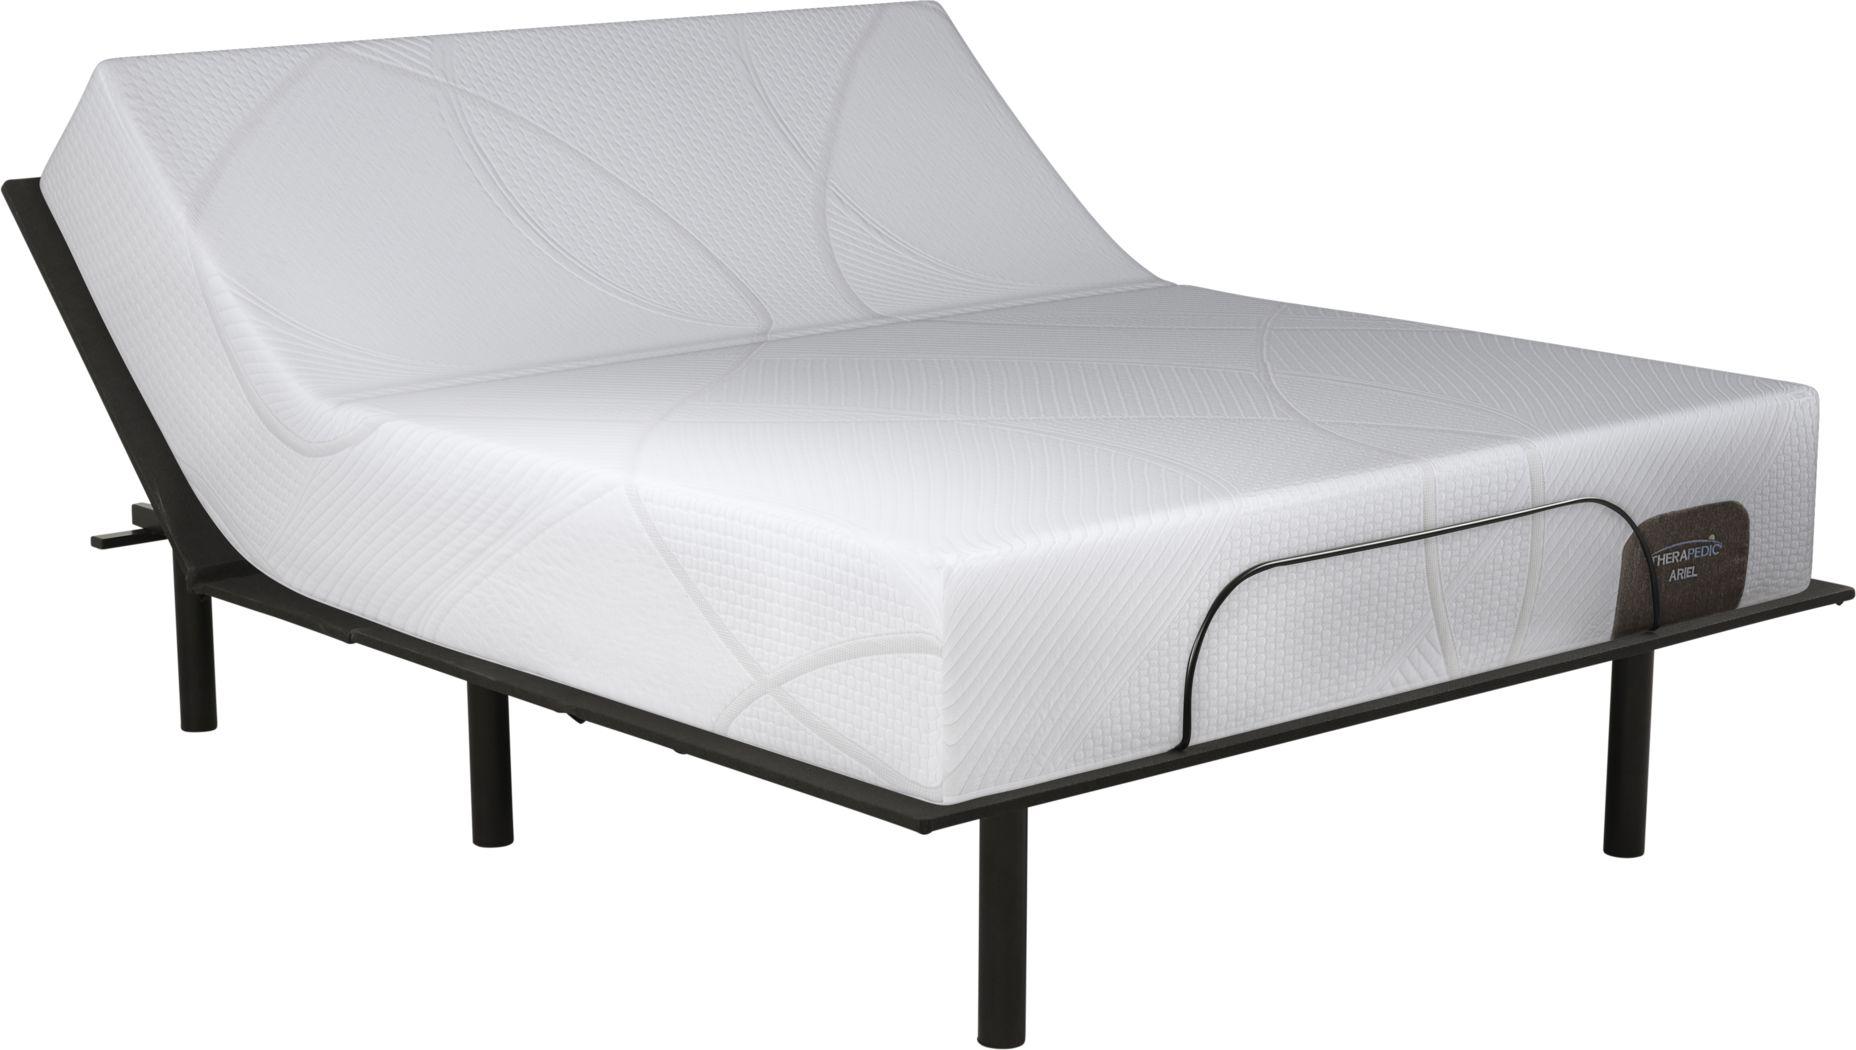 Therapedic Ariel King Mattress with RTG Sleep 2000 Adjustable Base